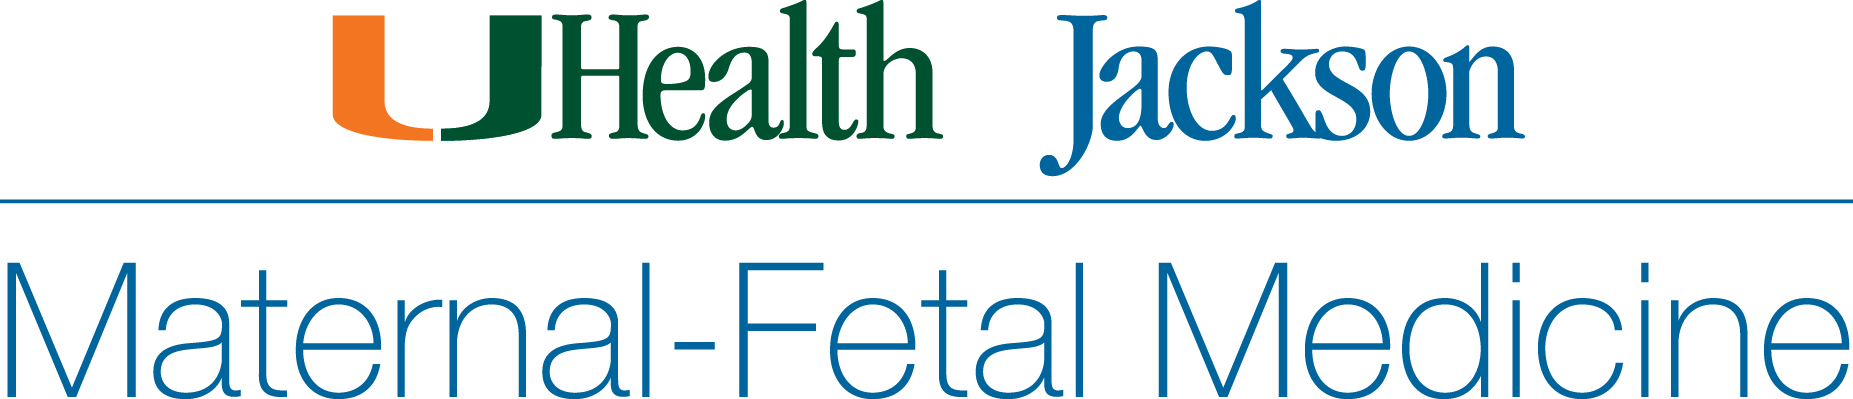 Logo for UHealth Jackson Maternal-Fetal Medicine services.